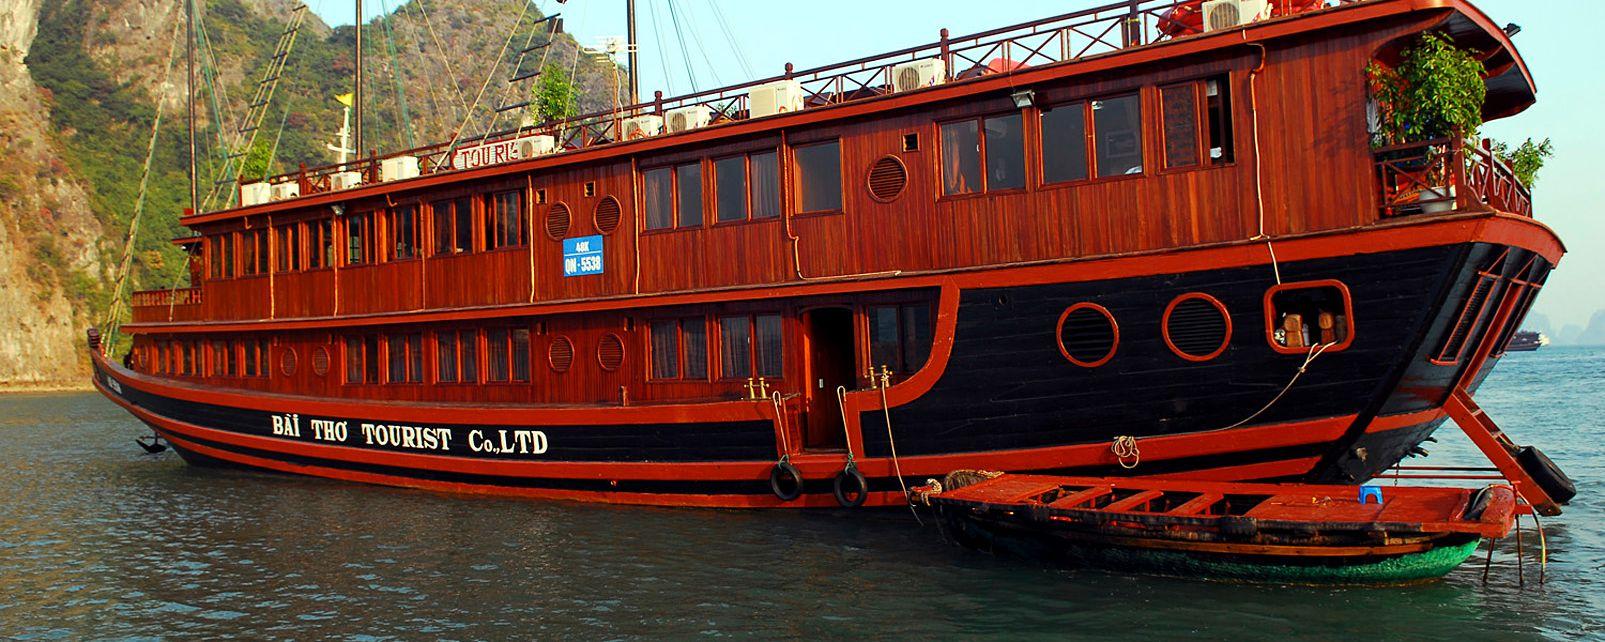 Hotel Ba�-Tho 99 (bateau)